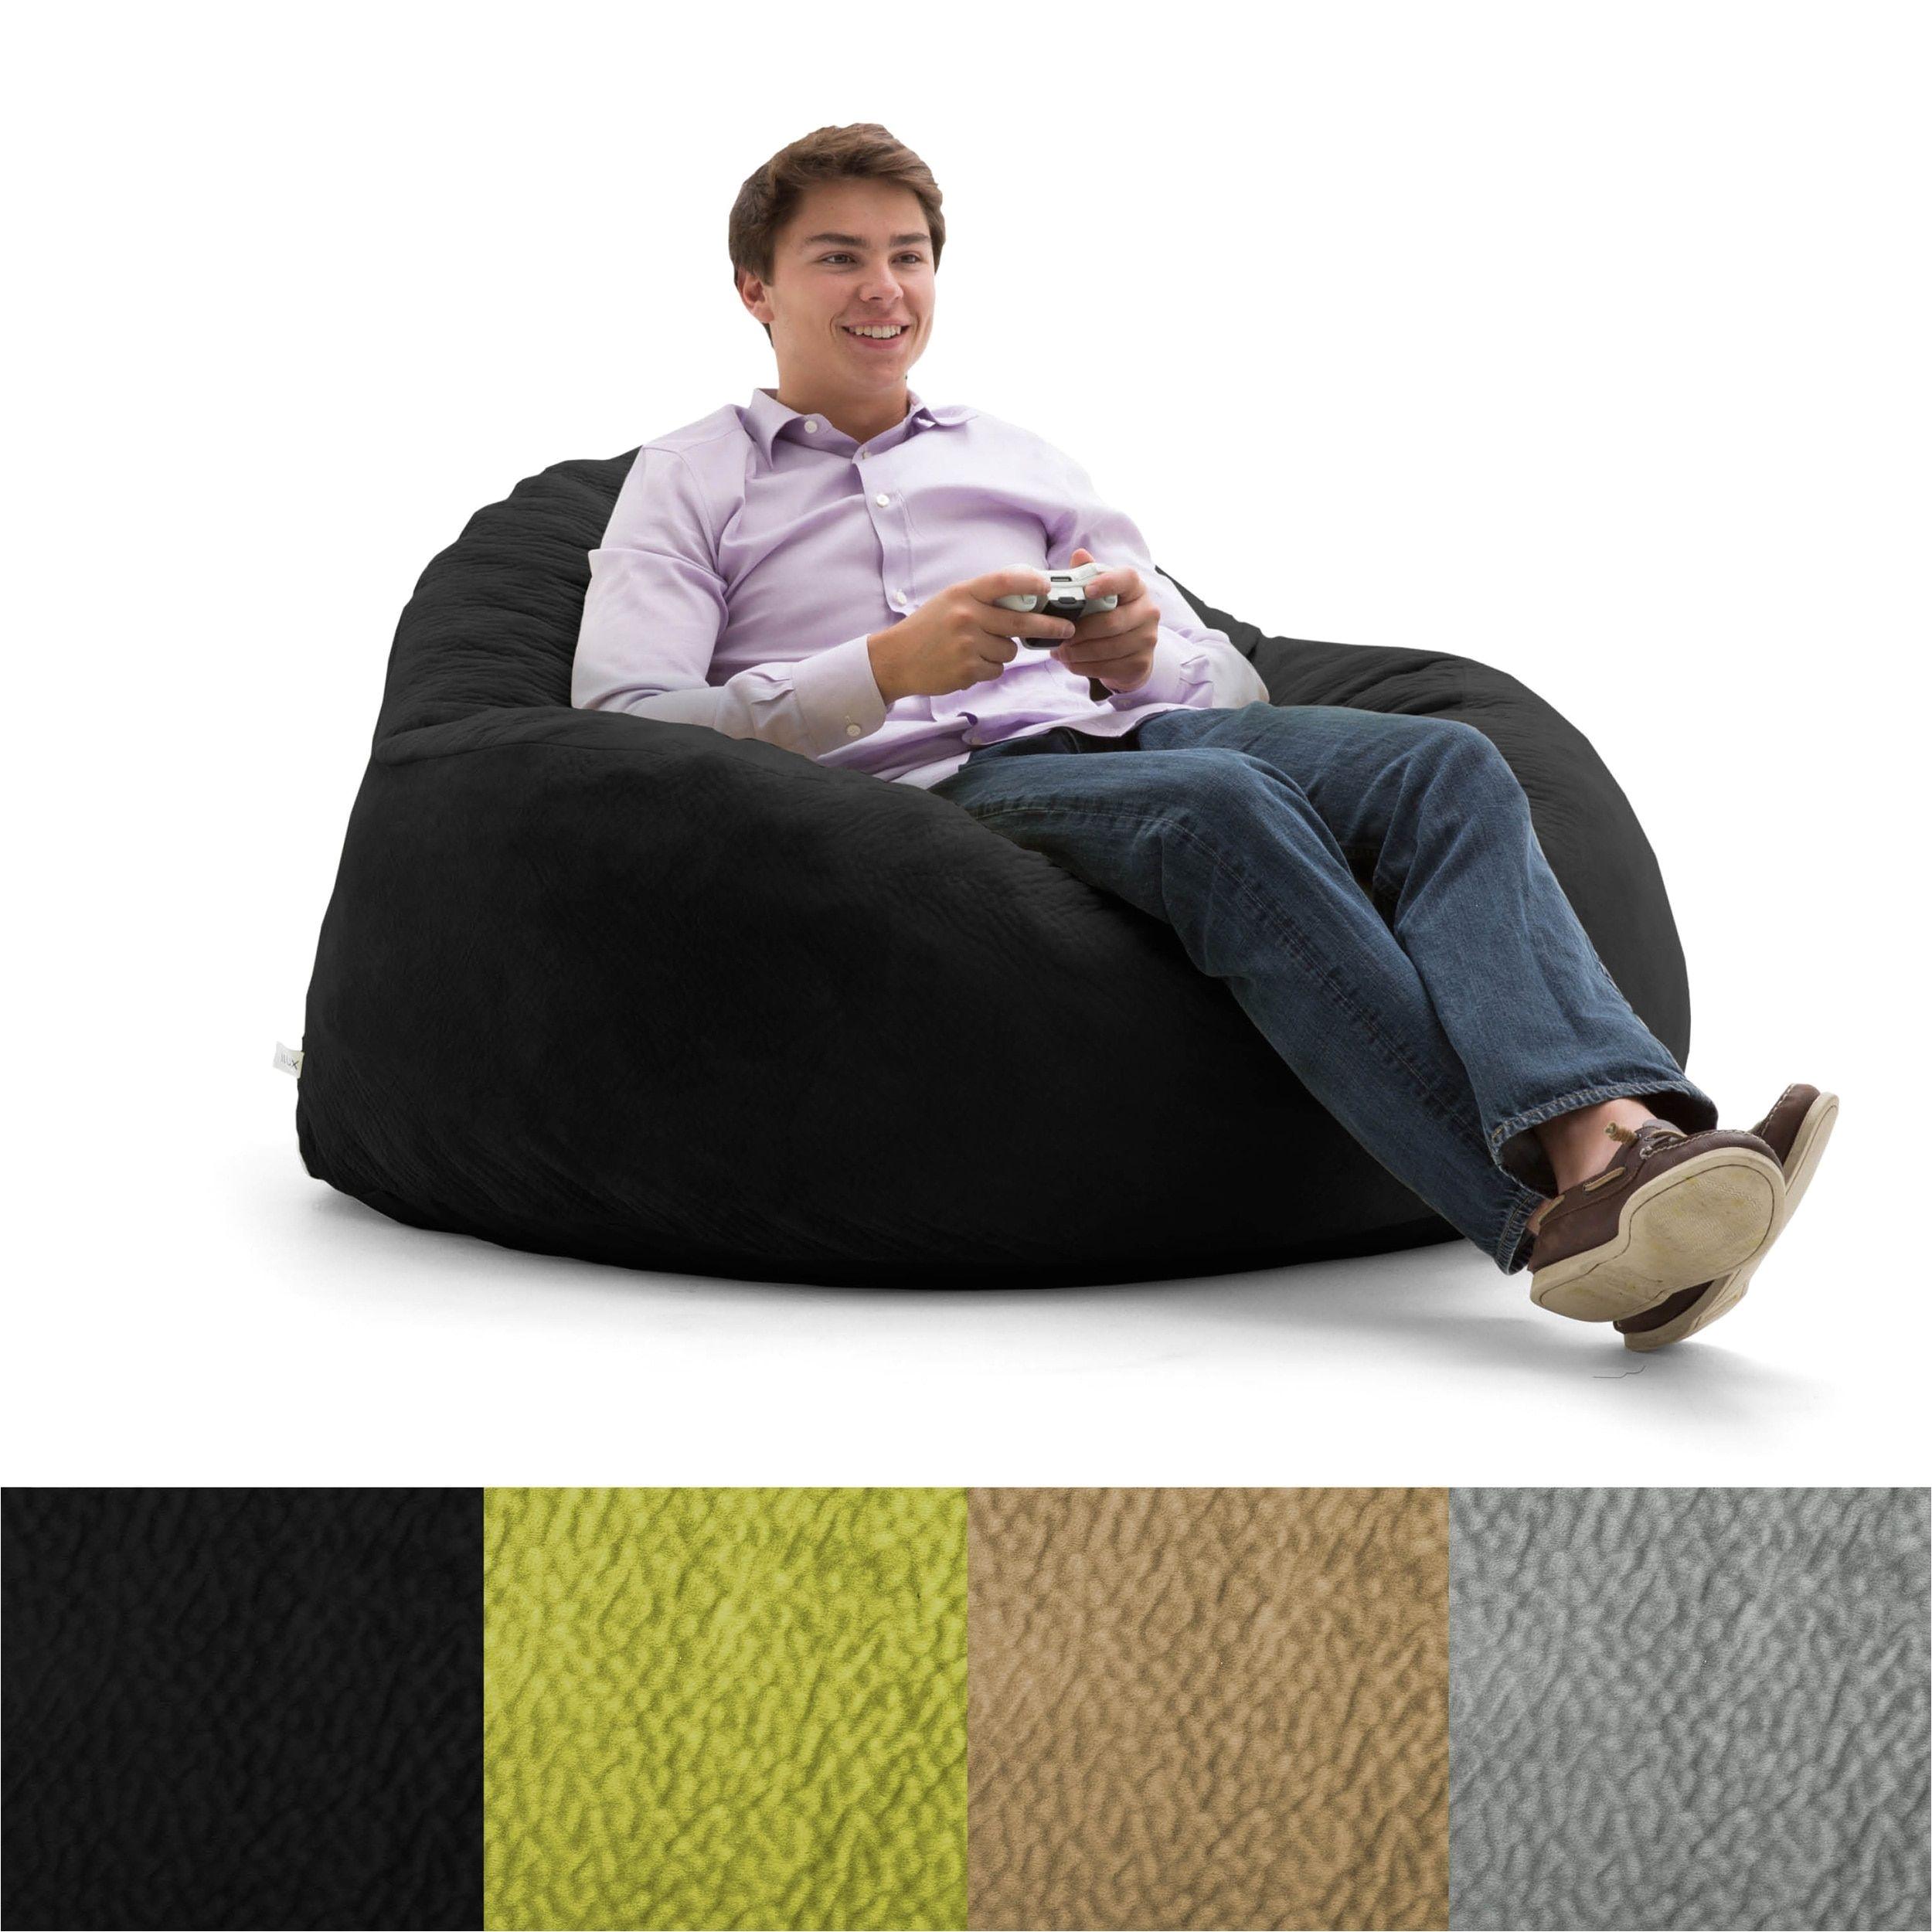 Big Bing Bag Chairs Fufsack Big Joe Lux Chillum Textured Memory Foam Bean Bag Chair